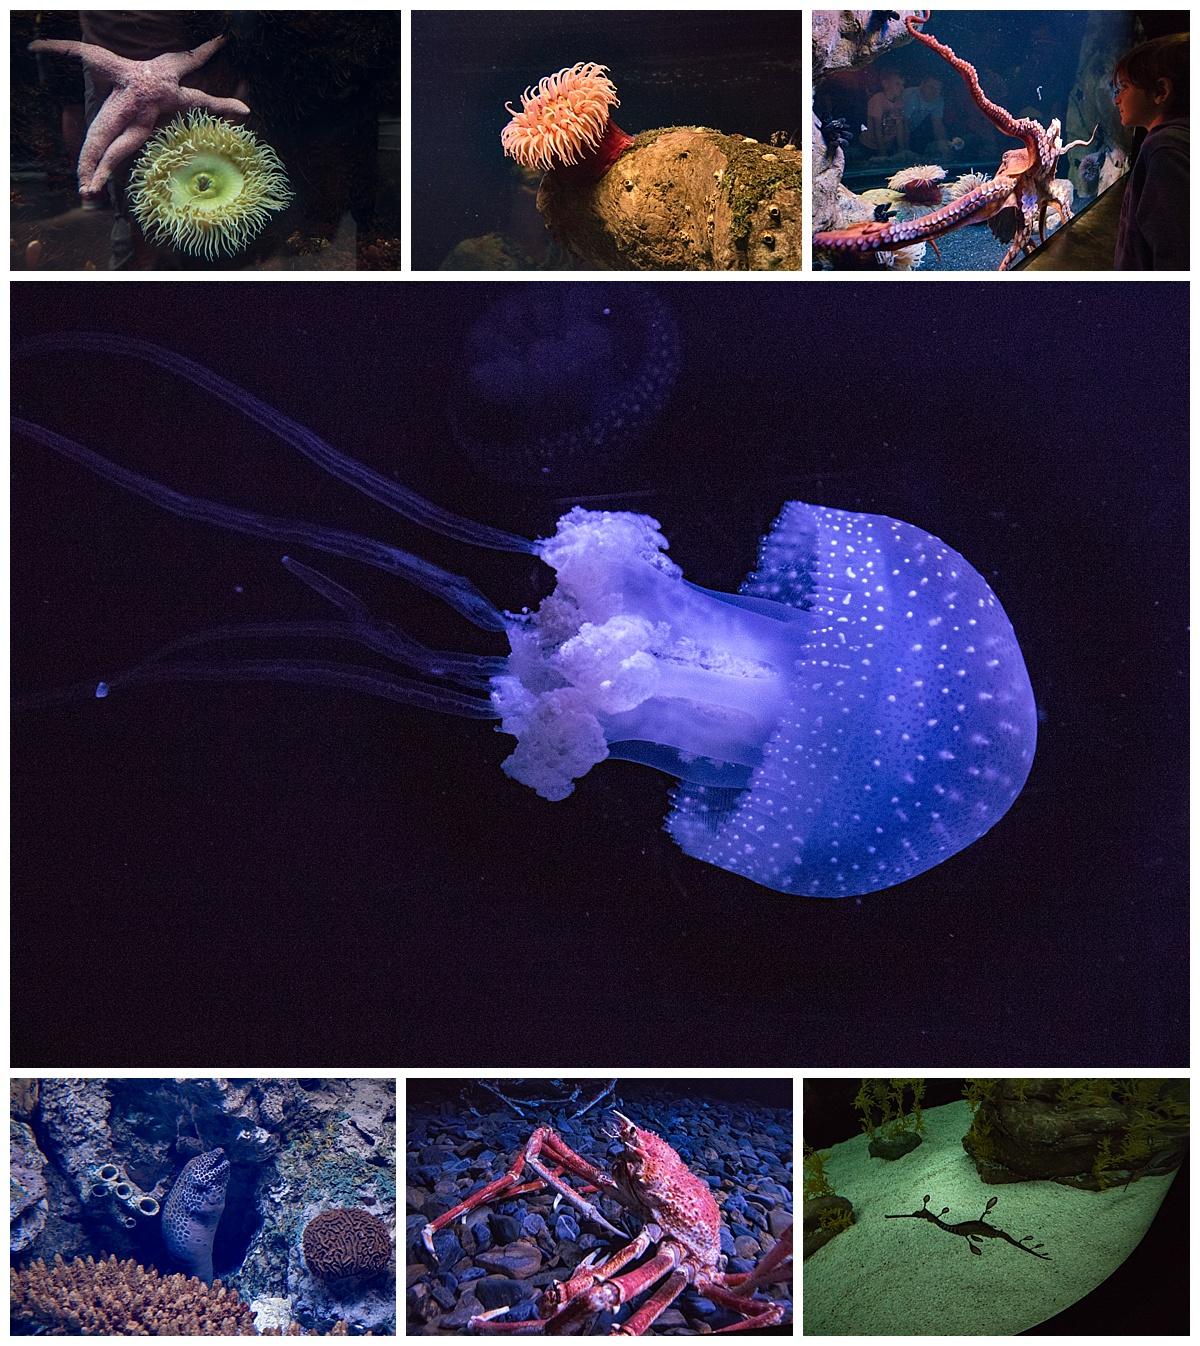 lisbon oceanarium 4- non fish aquatic